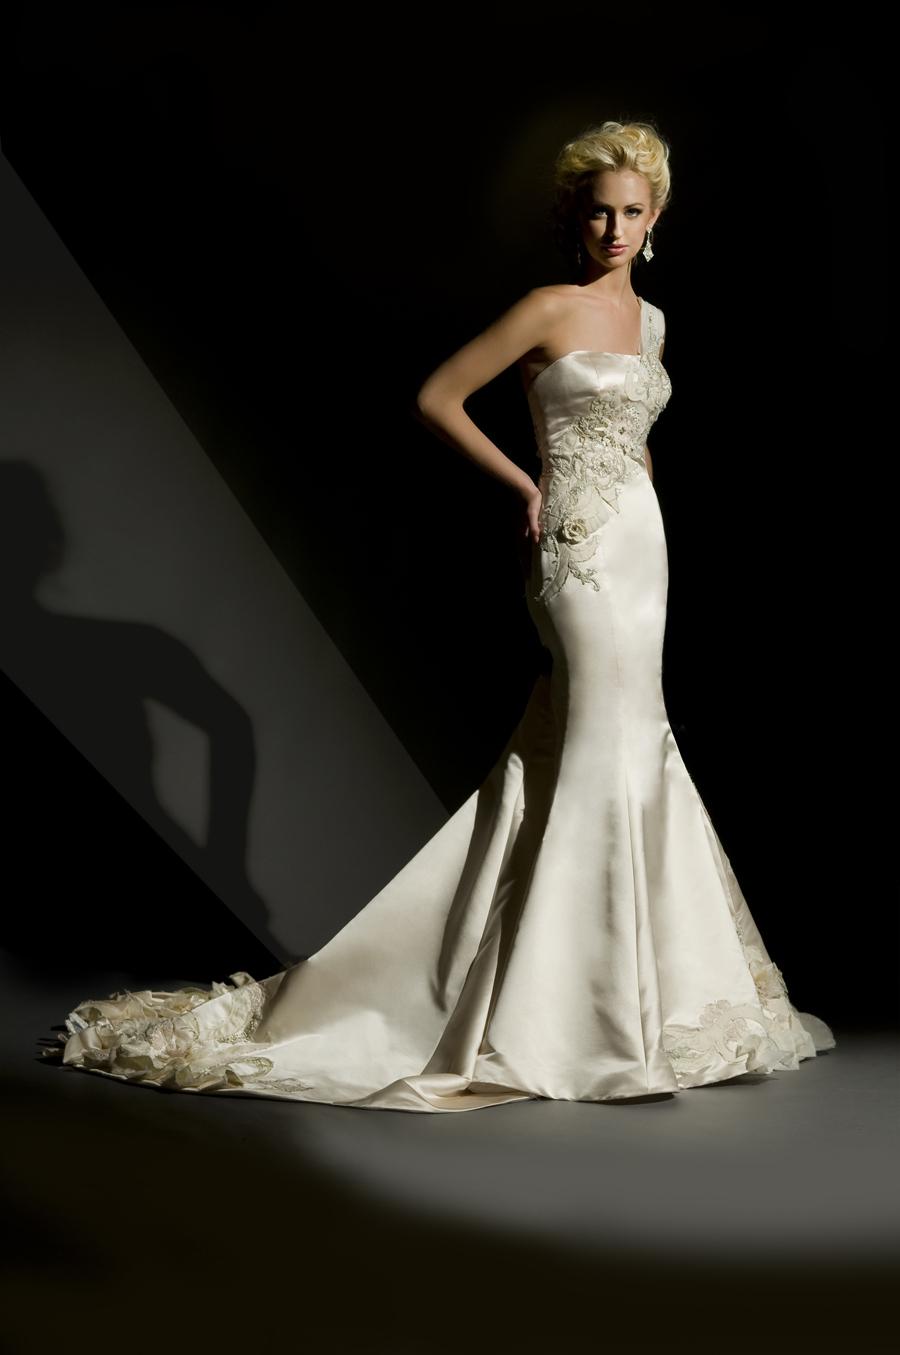 Romantic Wedding Dresses, Fashion, white, ivory, Romantic, Beading, Satin, Floor, Wedding dress, Natural, Eugenia couture, Beaded Wedding Dresses, satin wedding dresses, Floor Wedding Dresses